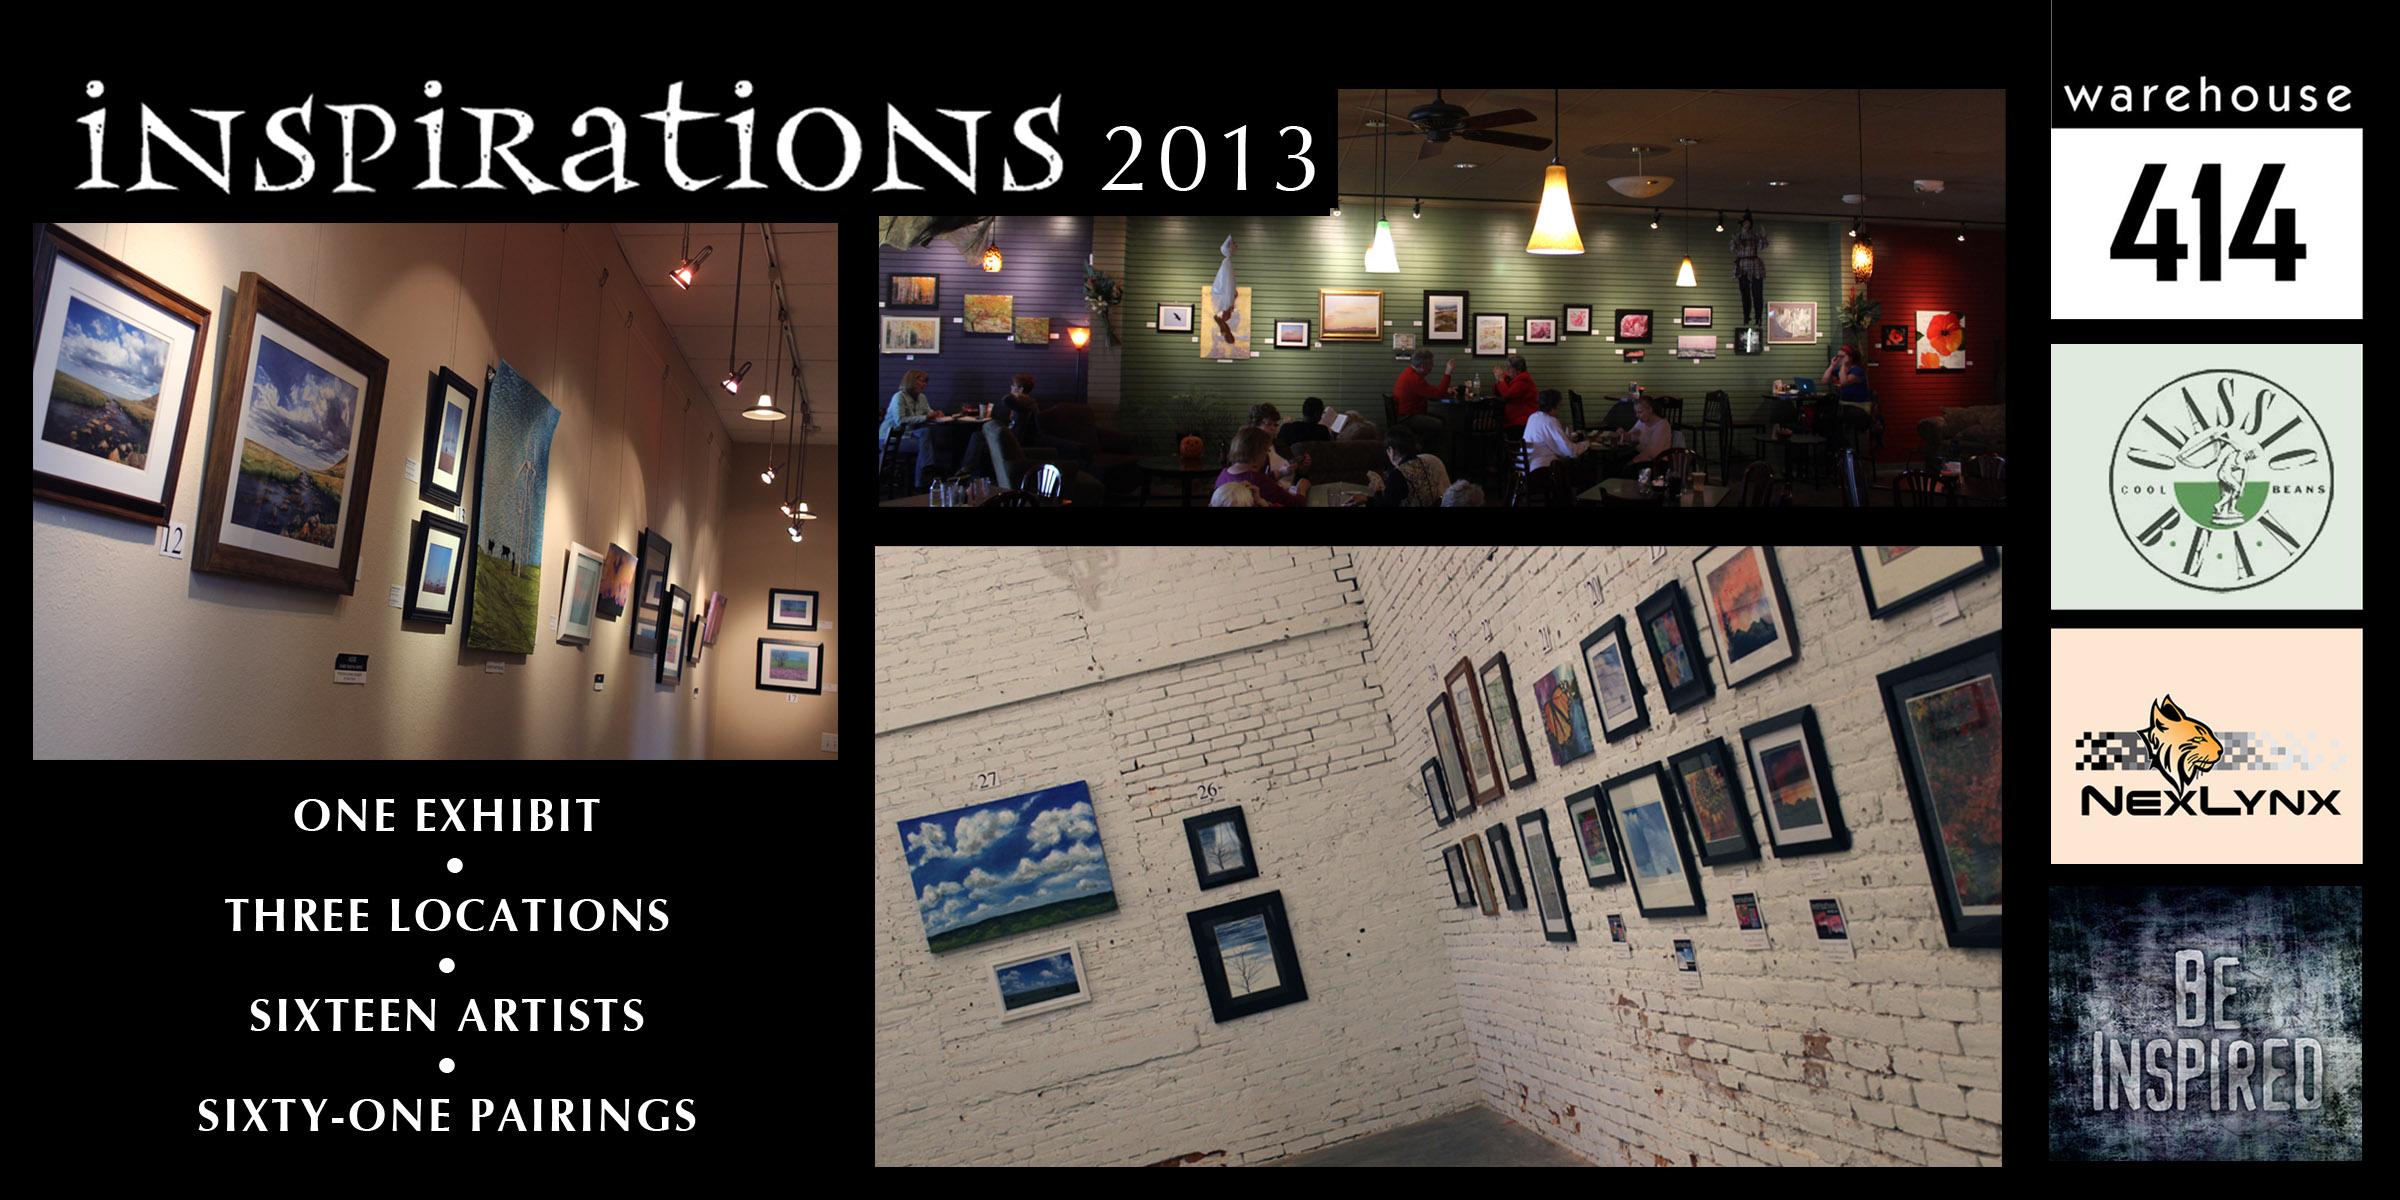 INSRIPATIONS_3 LOCATIONS 2013.jpg